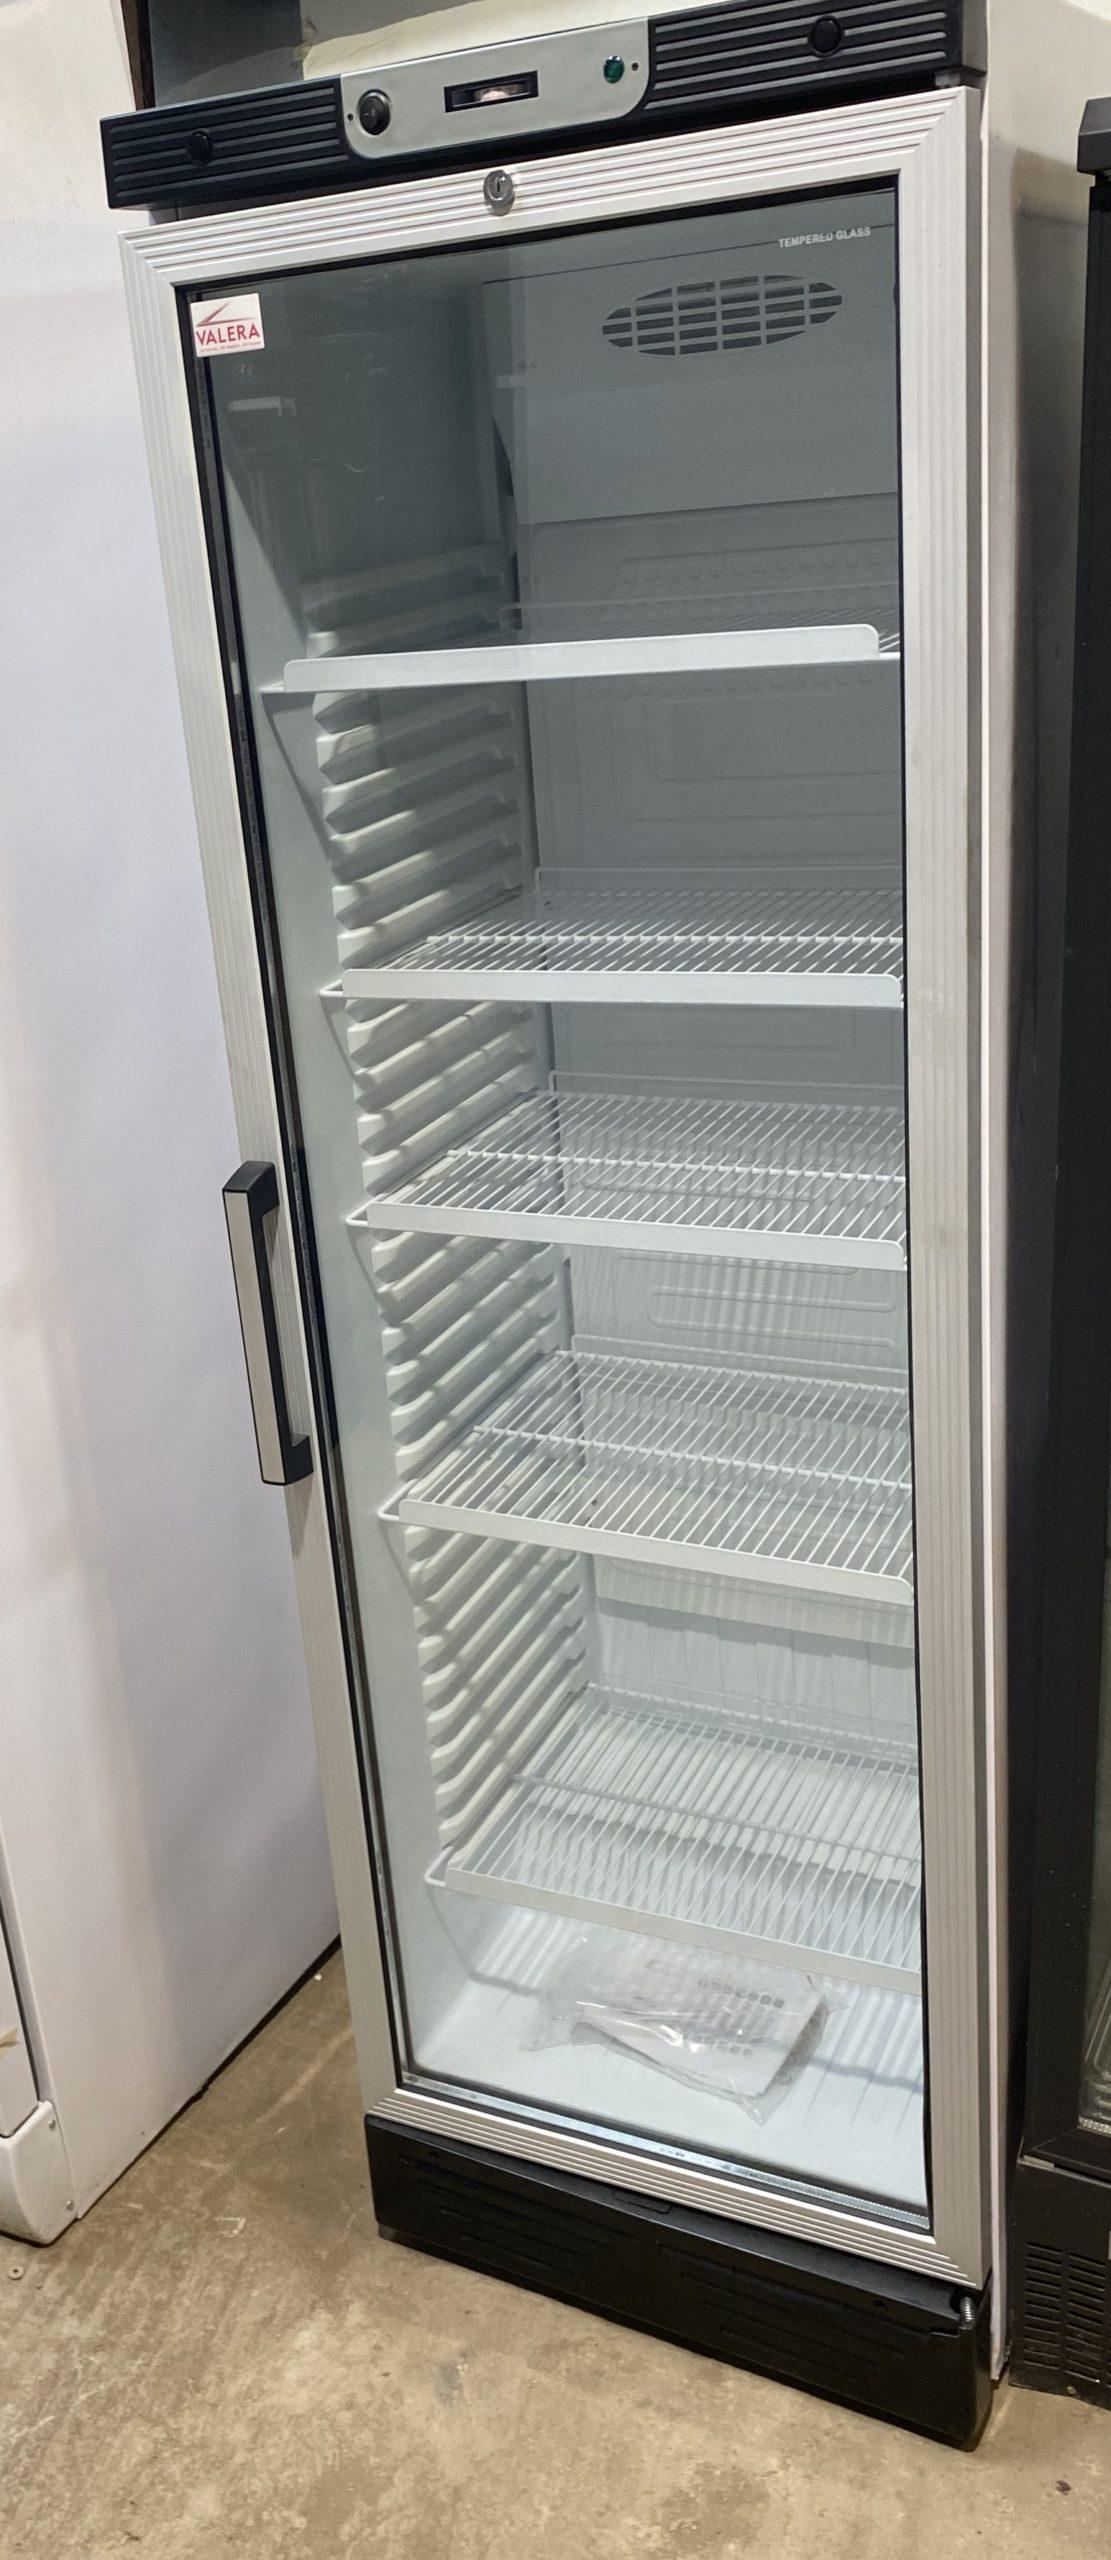 VALERA KBC 390 Single Door Display Fridge 390 Litres – Brand New B Grade